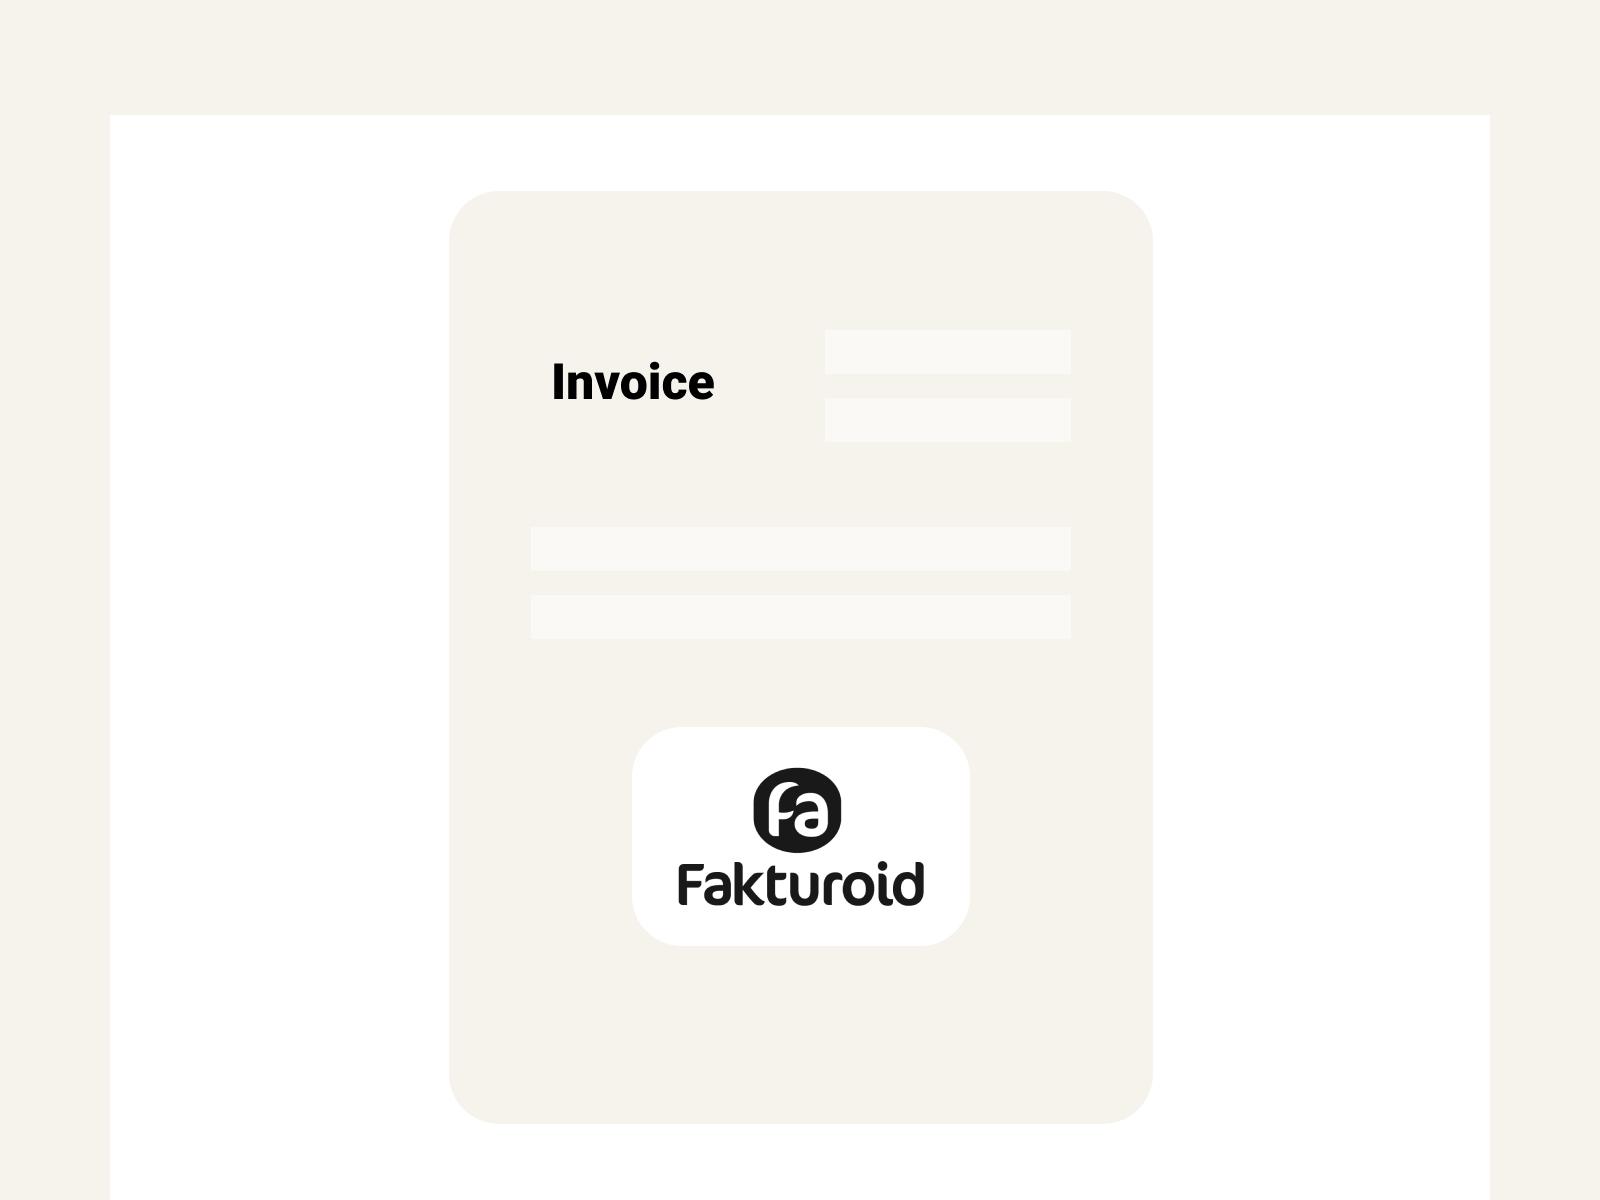 Fakturoid Shopify 1